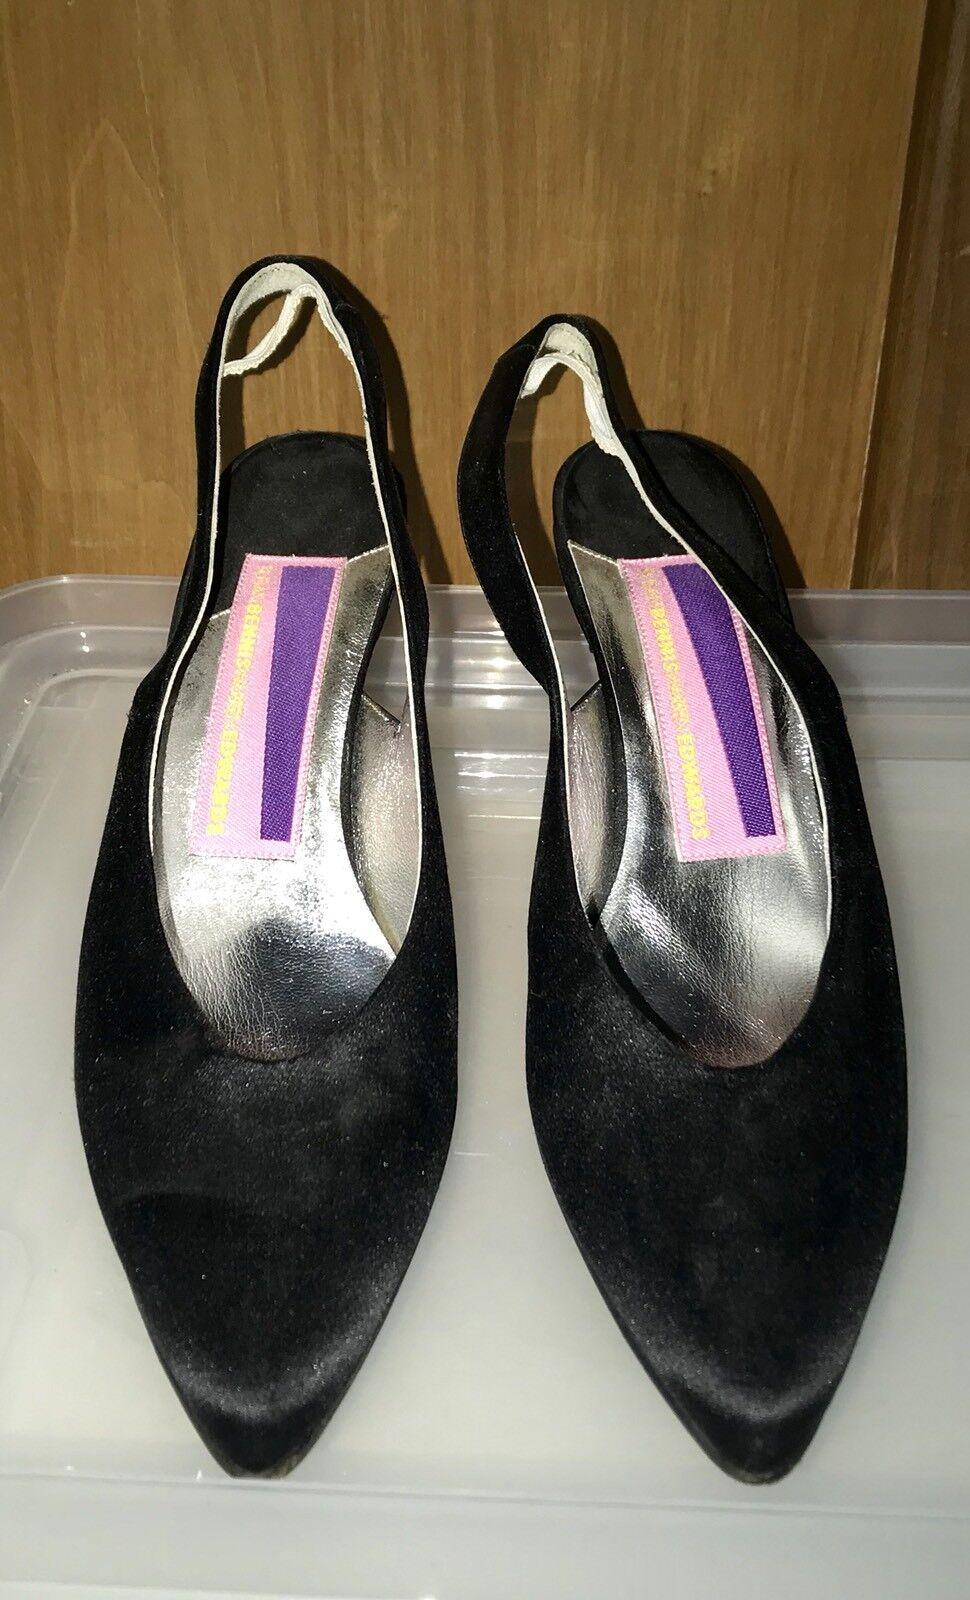 Susan bennis Negro Satinado ESLINGA vuelta Zapatos Zapatos vuelta 8 1 2 B ejecutar pequeños d9a756